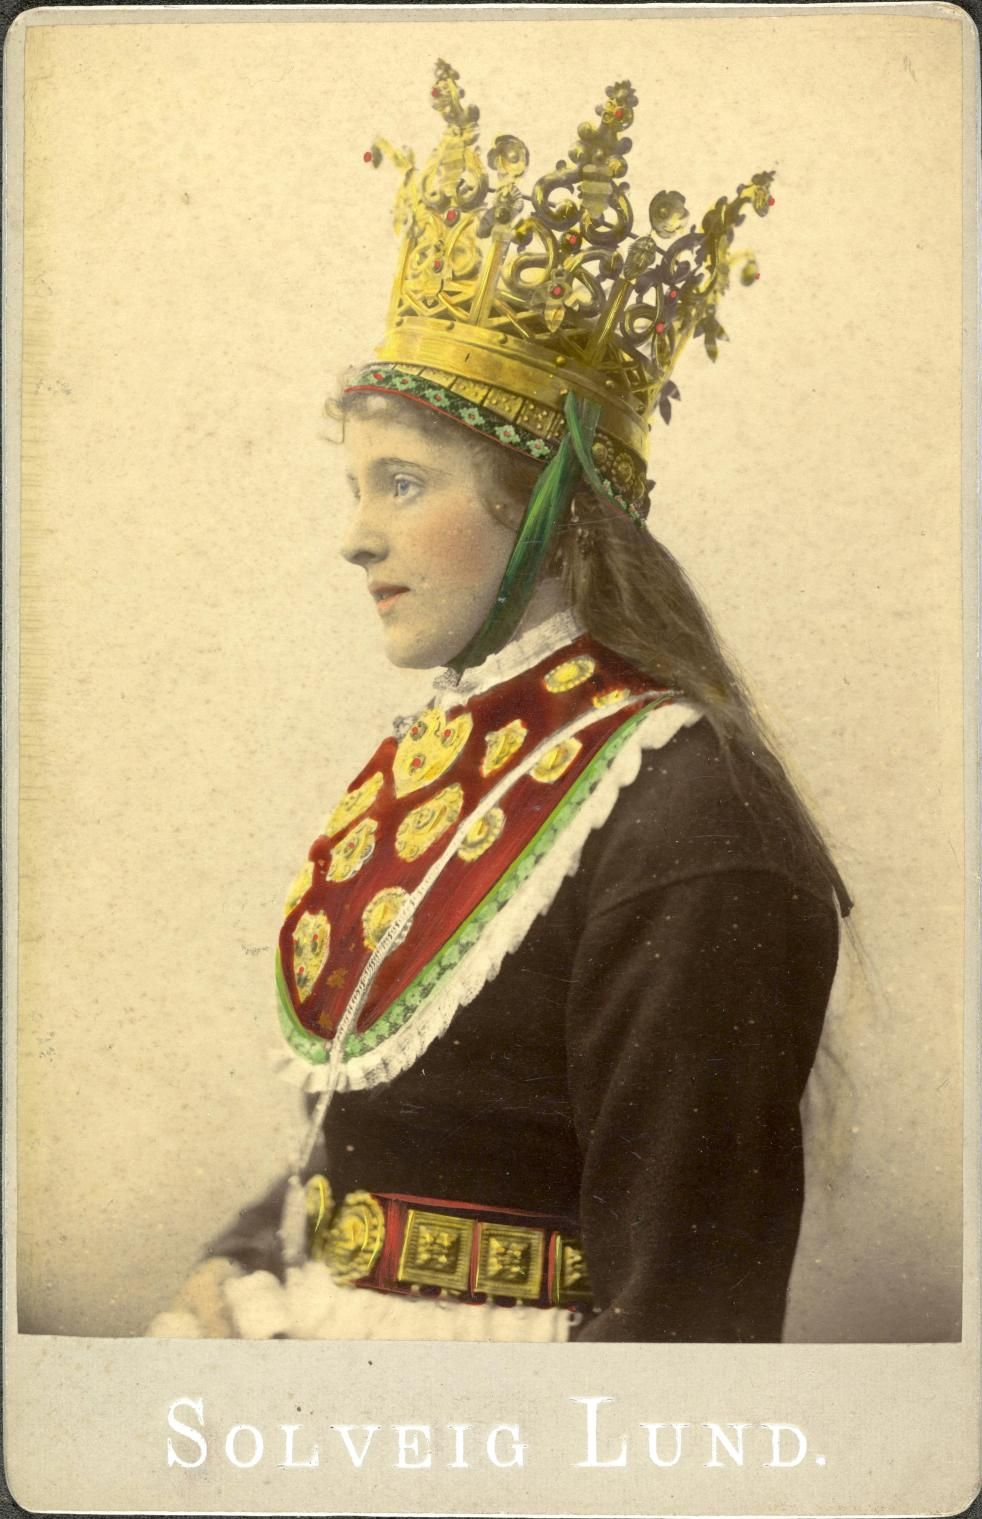 Norwegian Sunday Bridal Crowns Part V, Photography